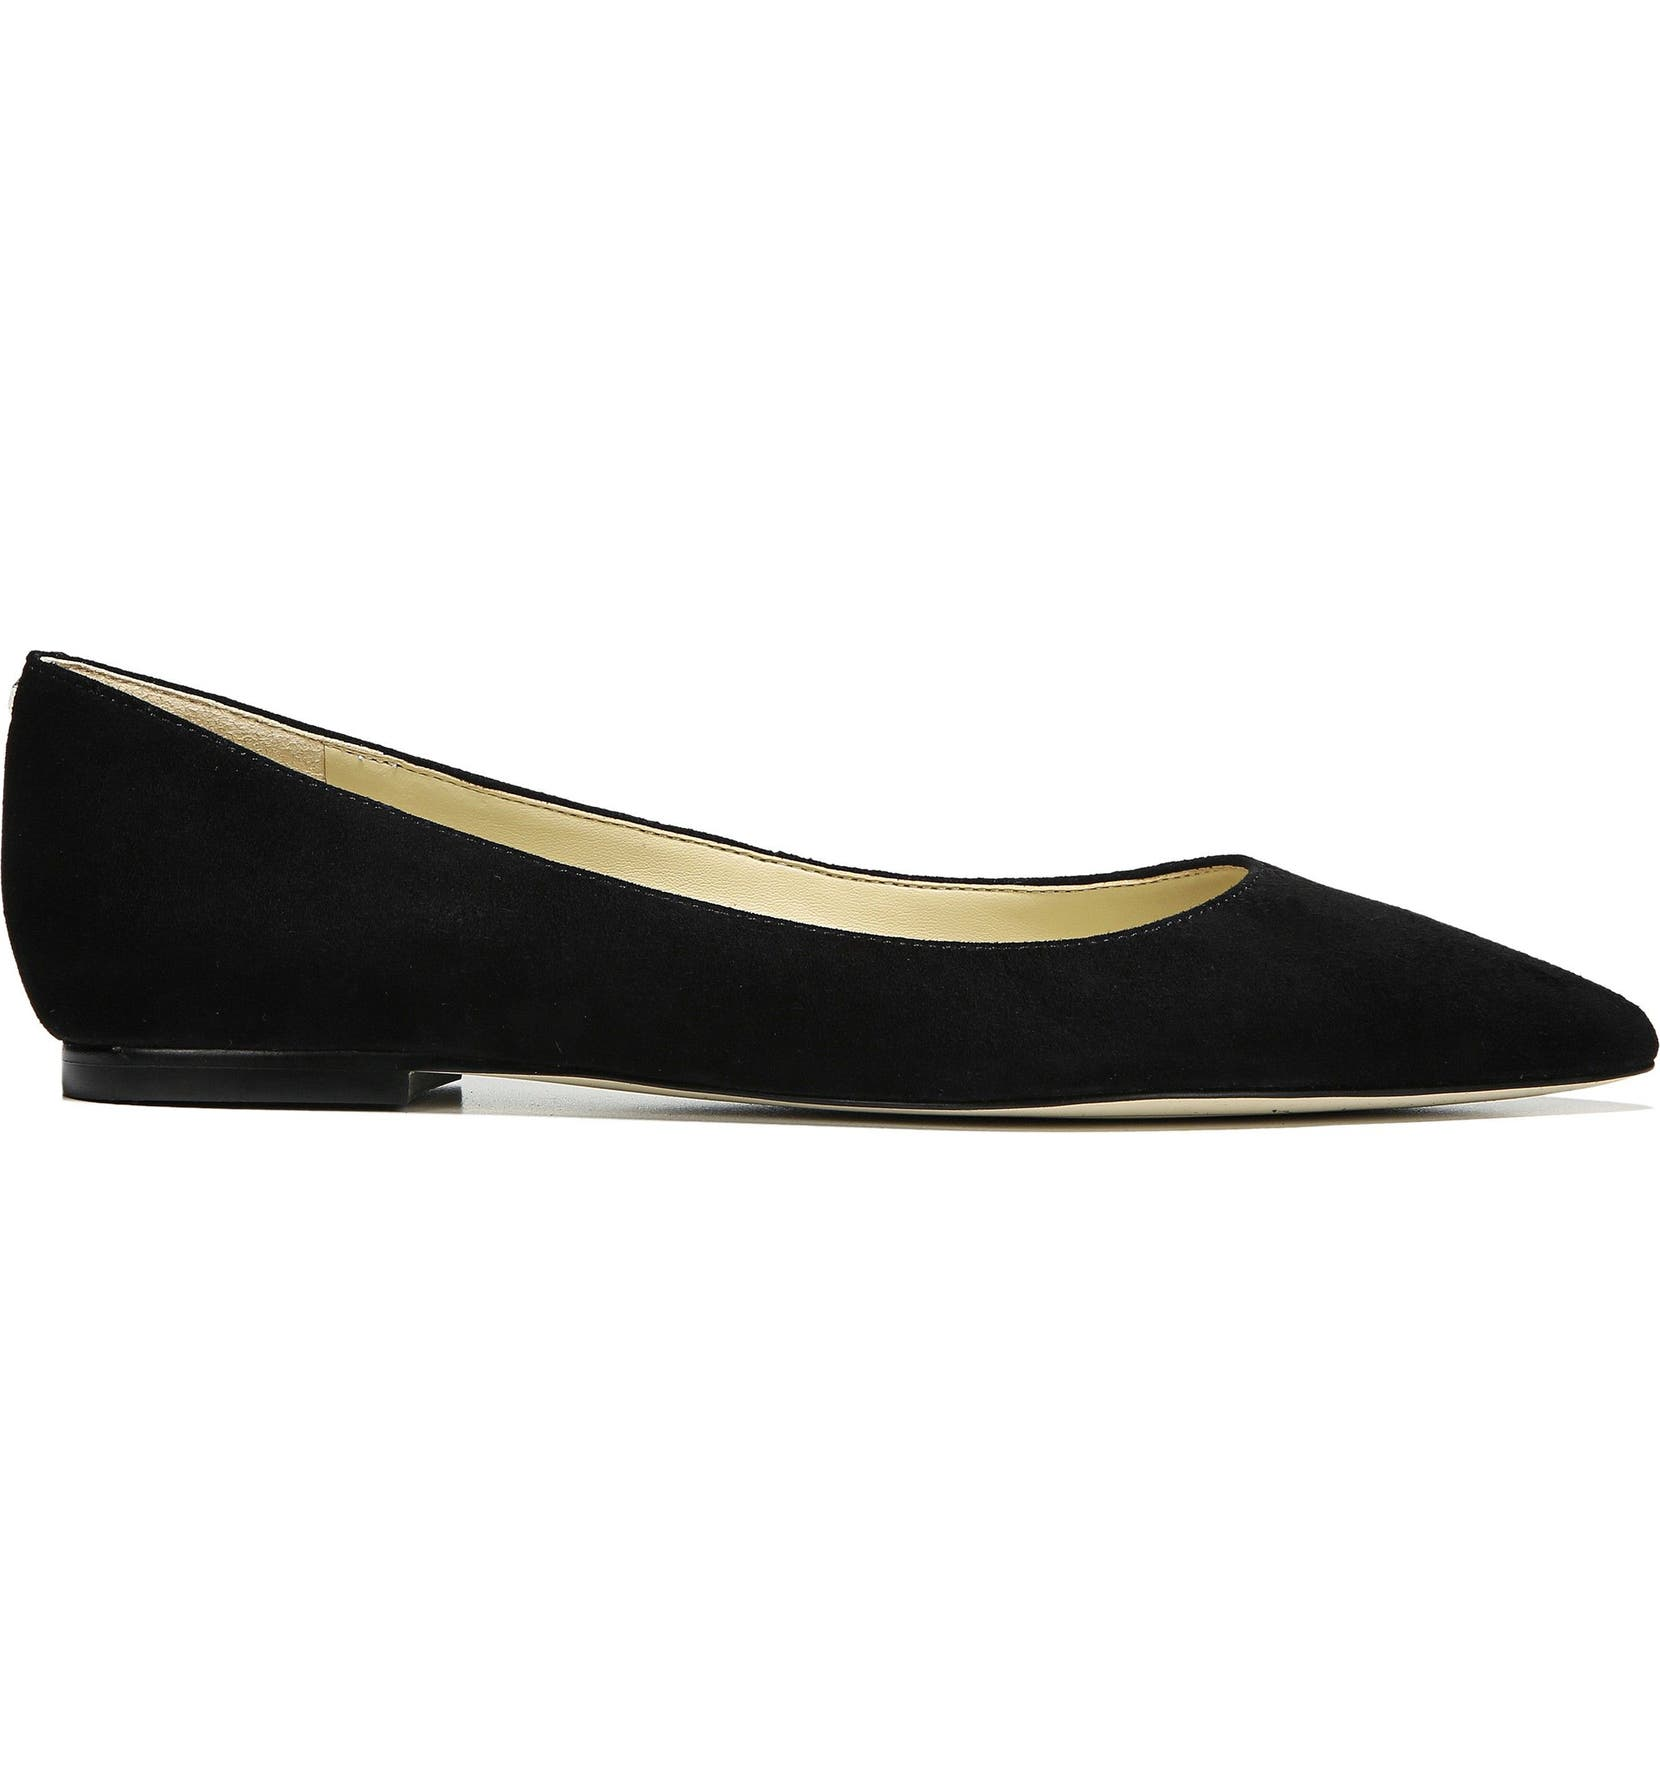 03aa5183001d Sam Edelman  Rae  Pointy Toe Ballet Flat (Women)